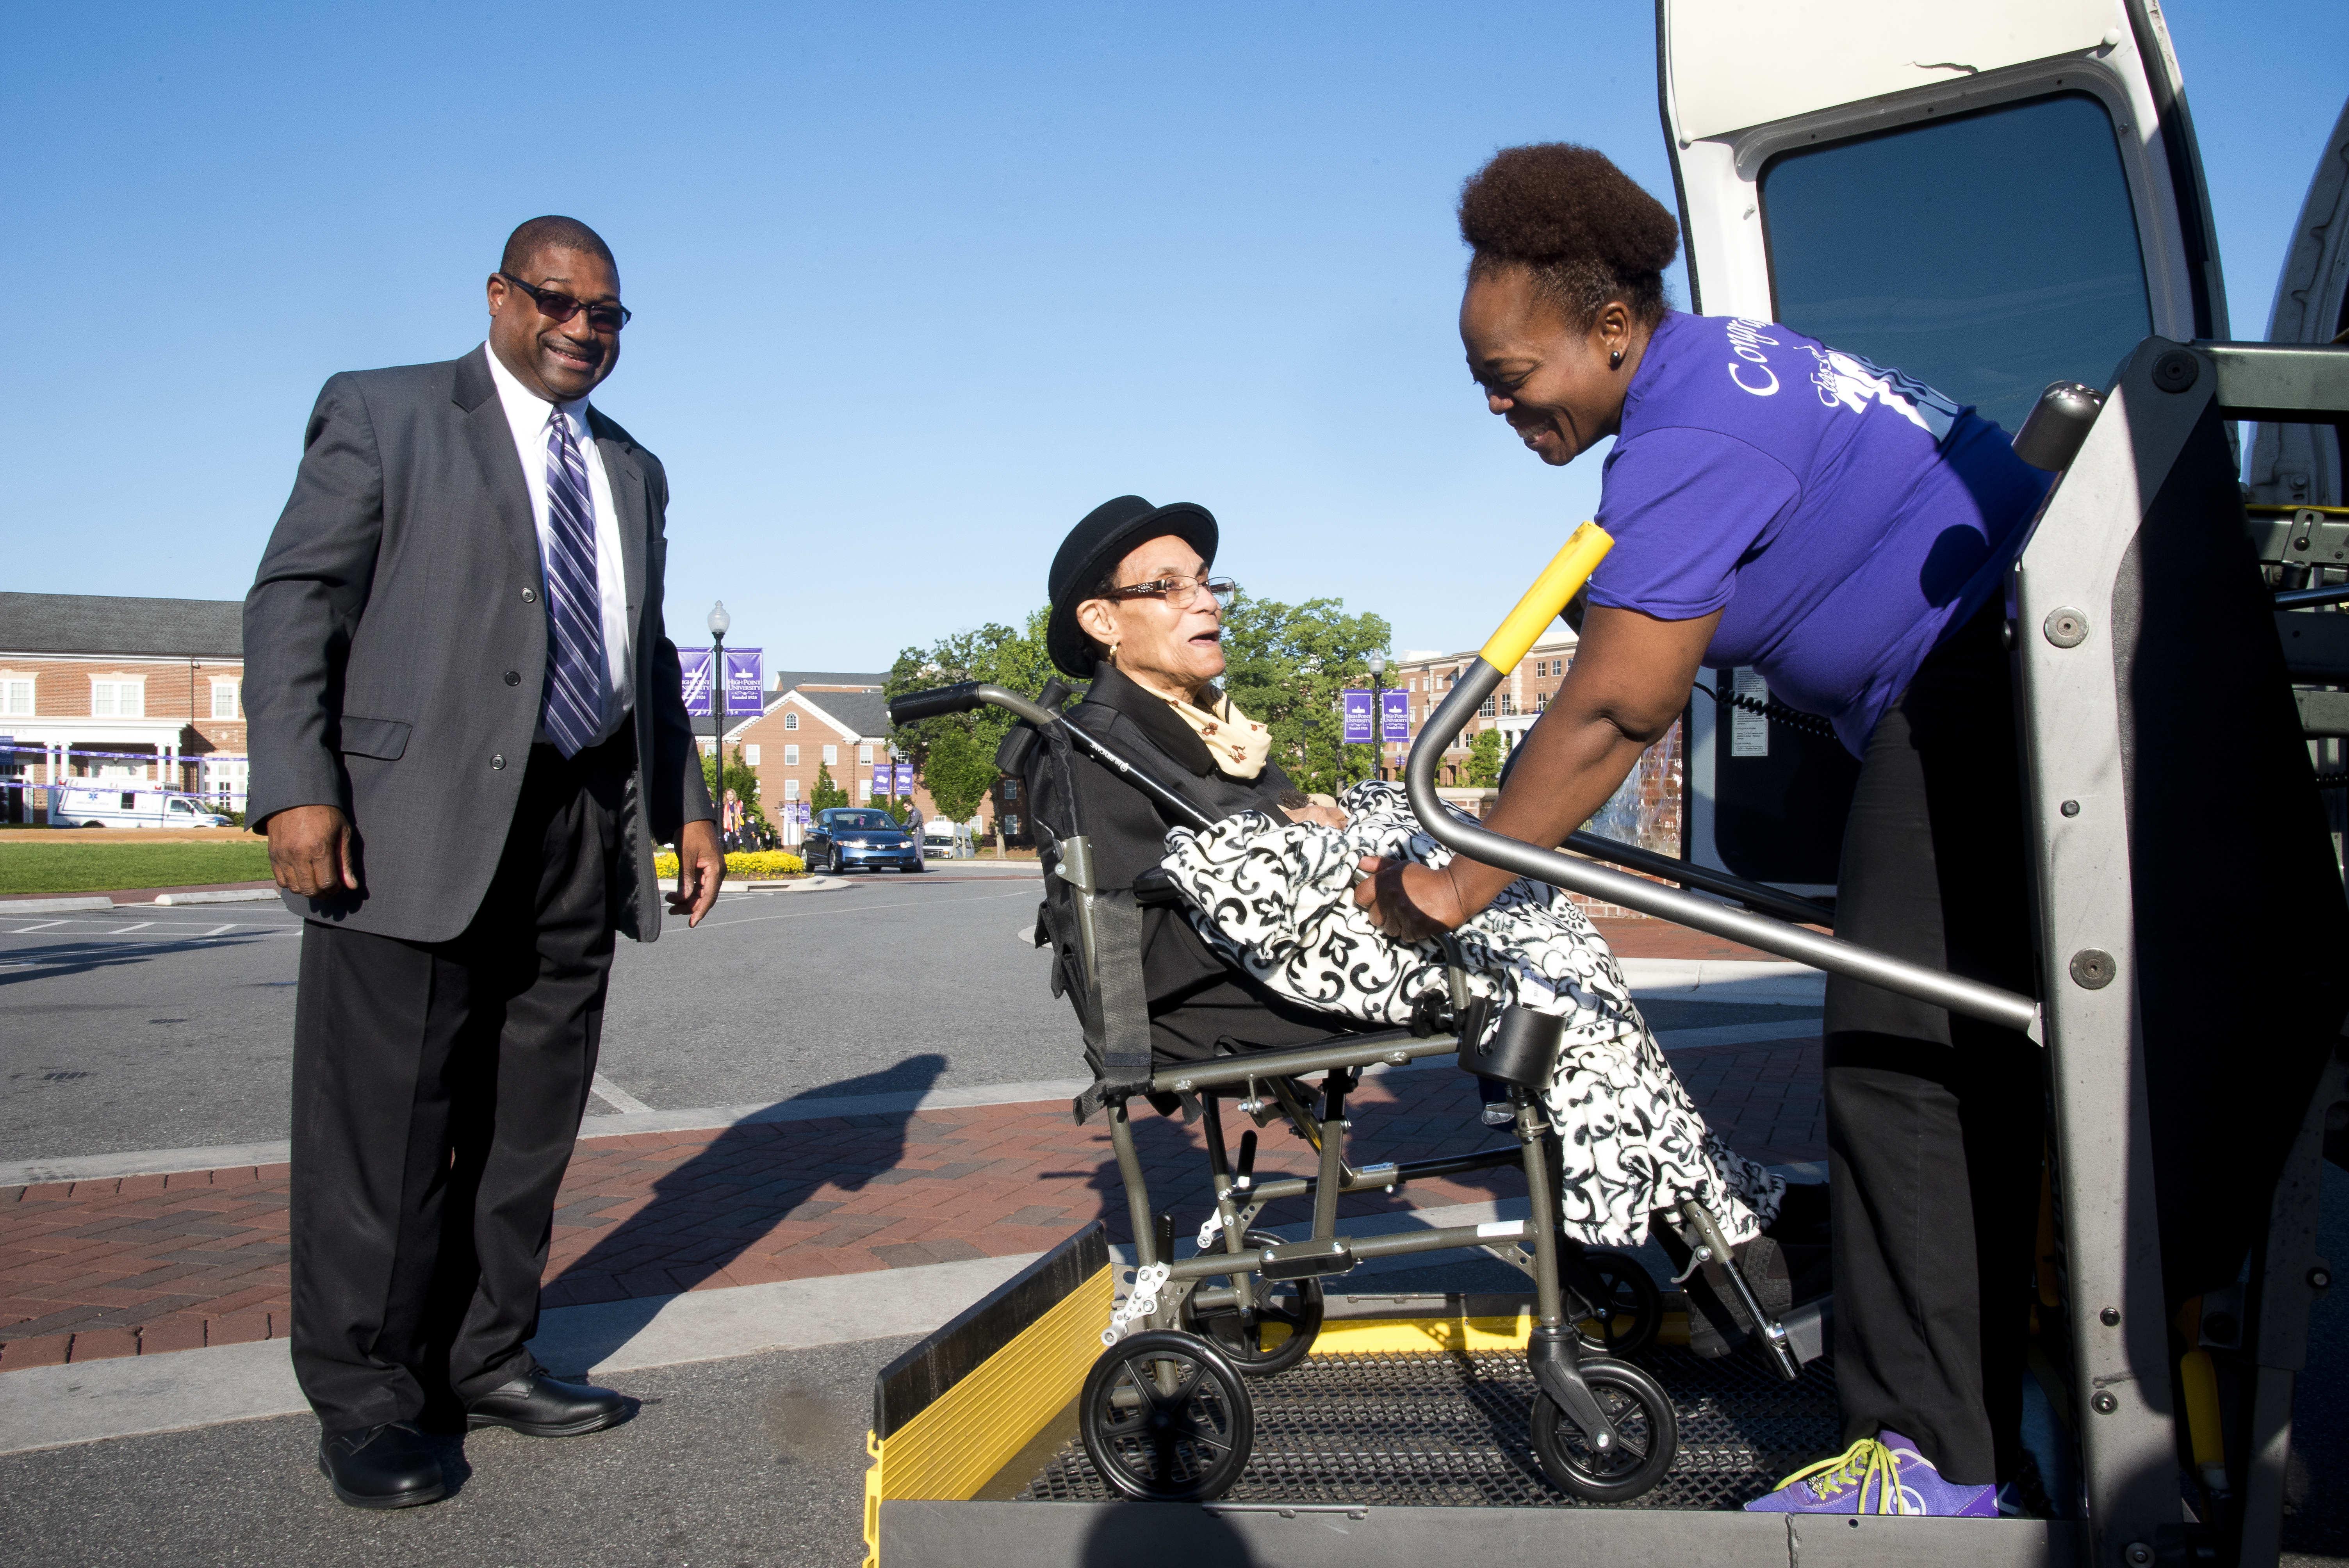 Wheelchair Transportation High Point, NC